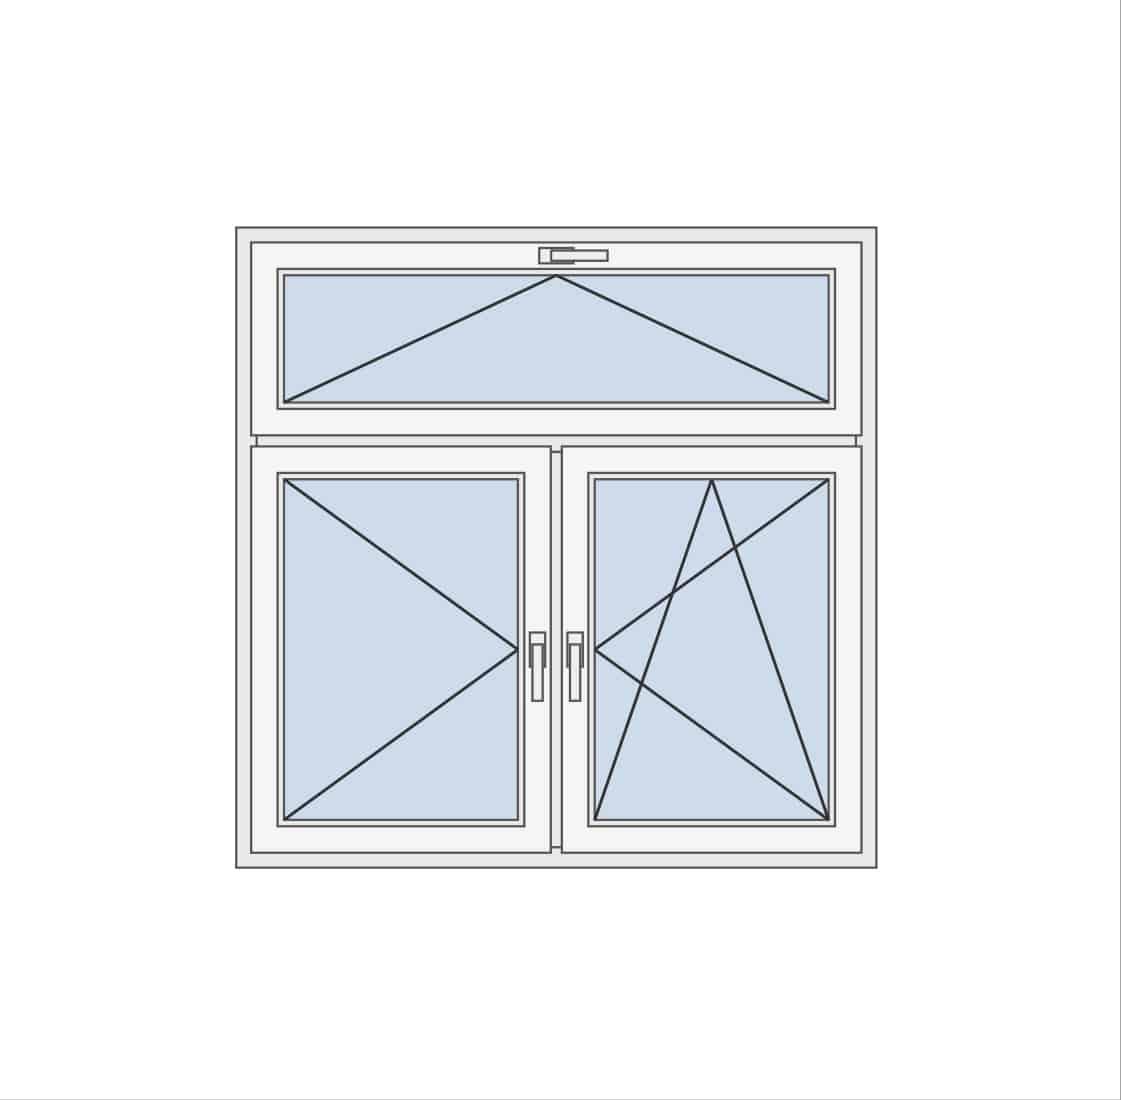 Dvokrilni prozor sa ventusom